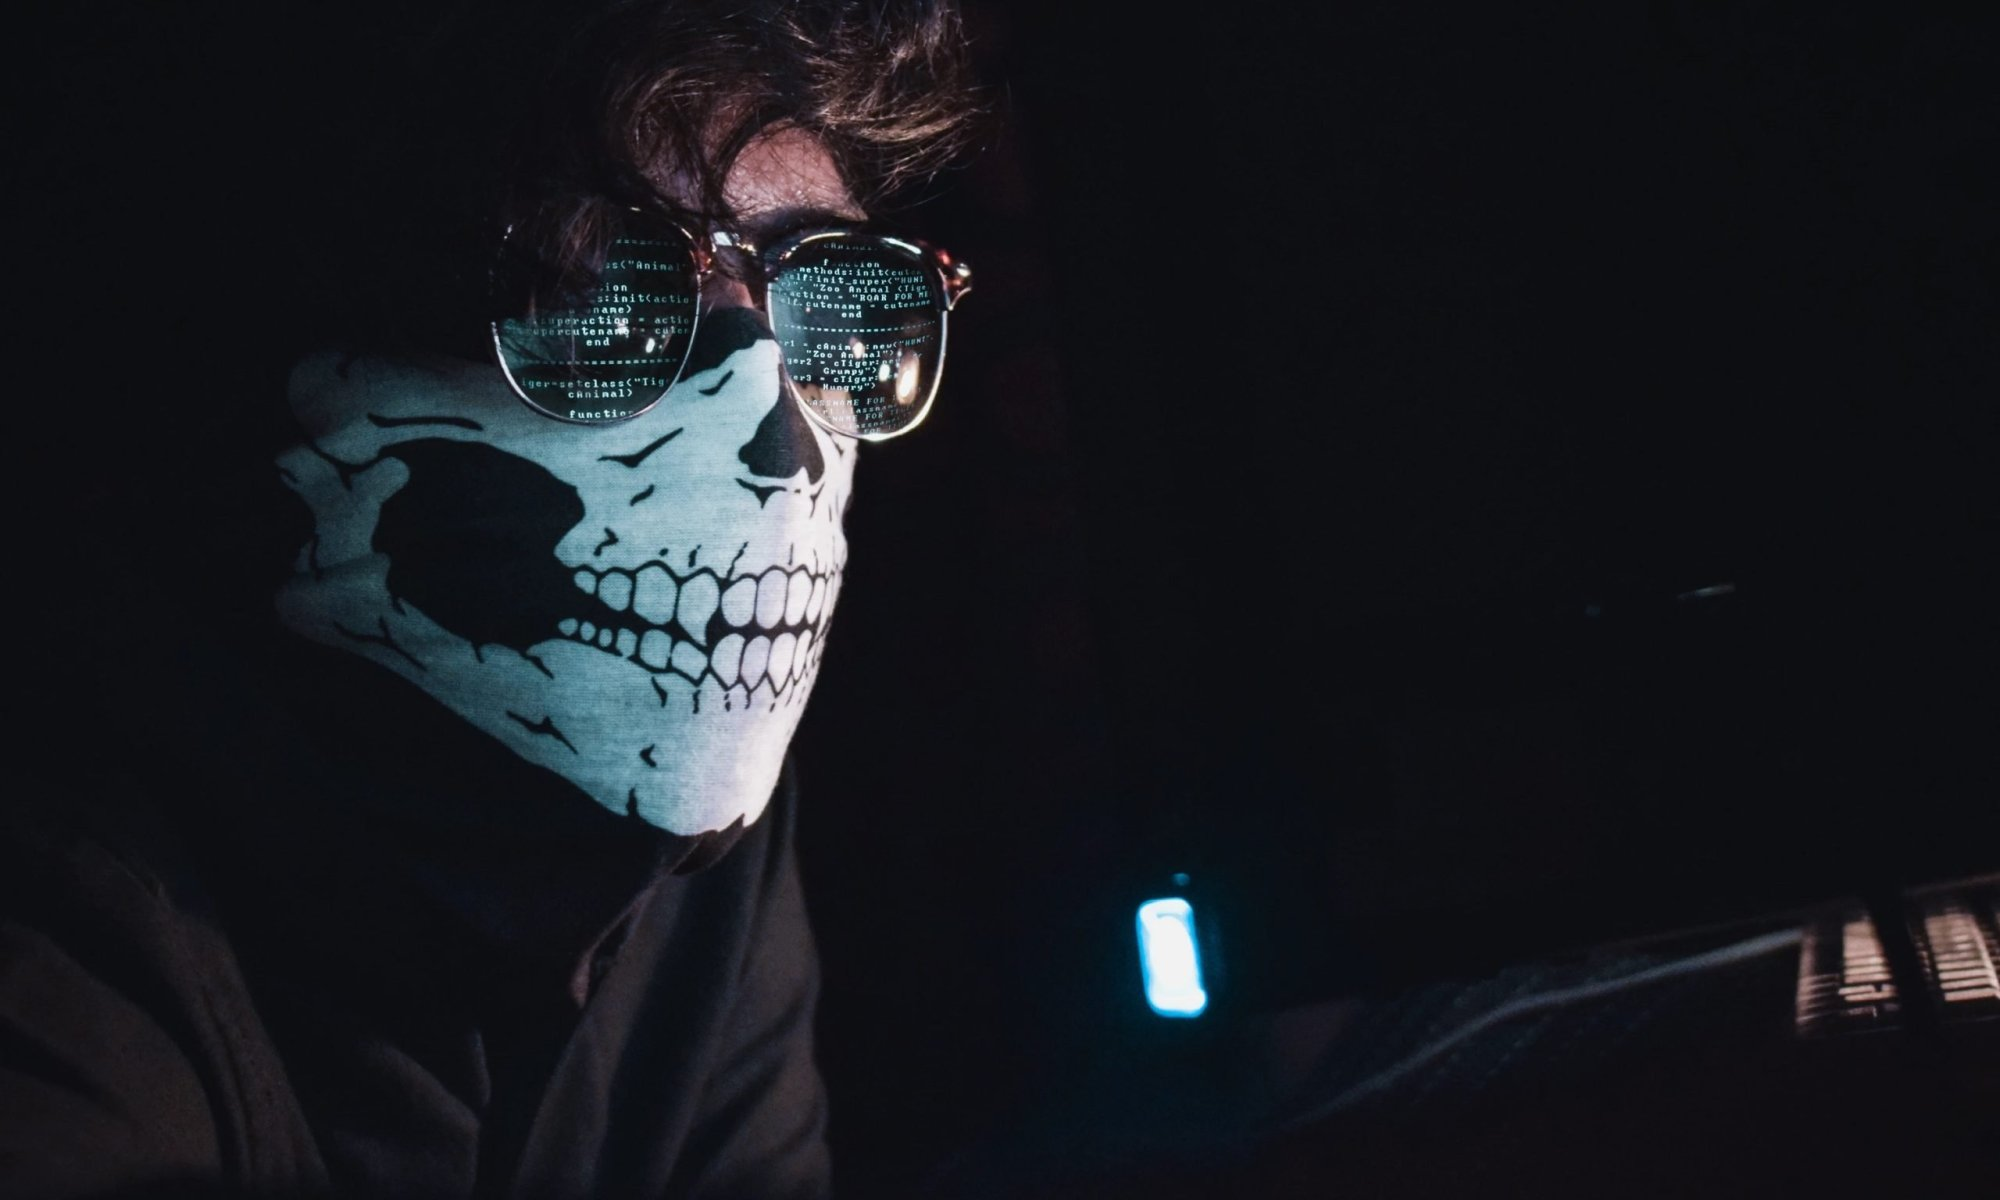 moderna hacks software life